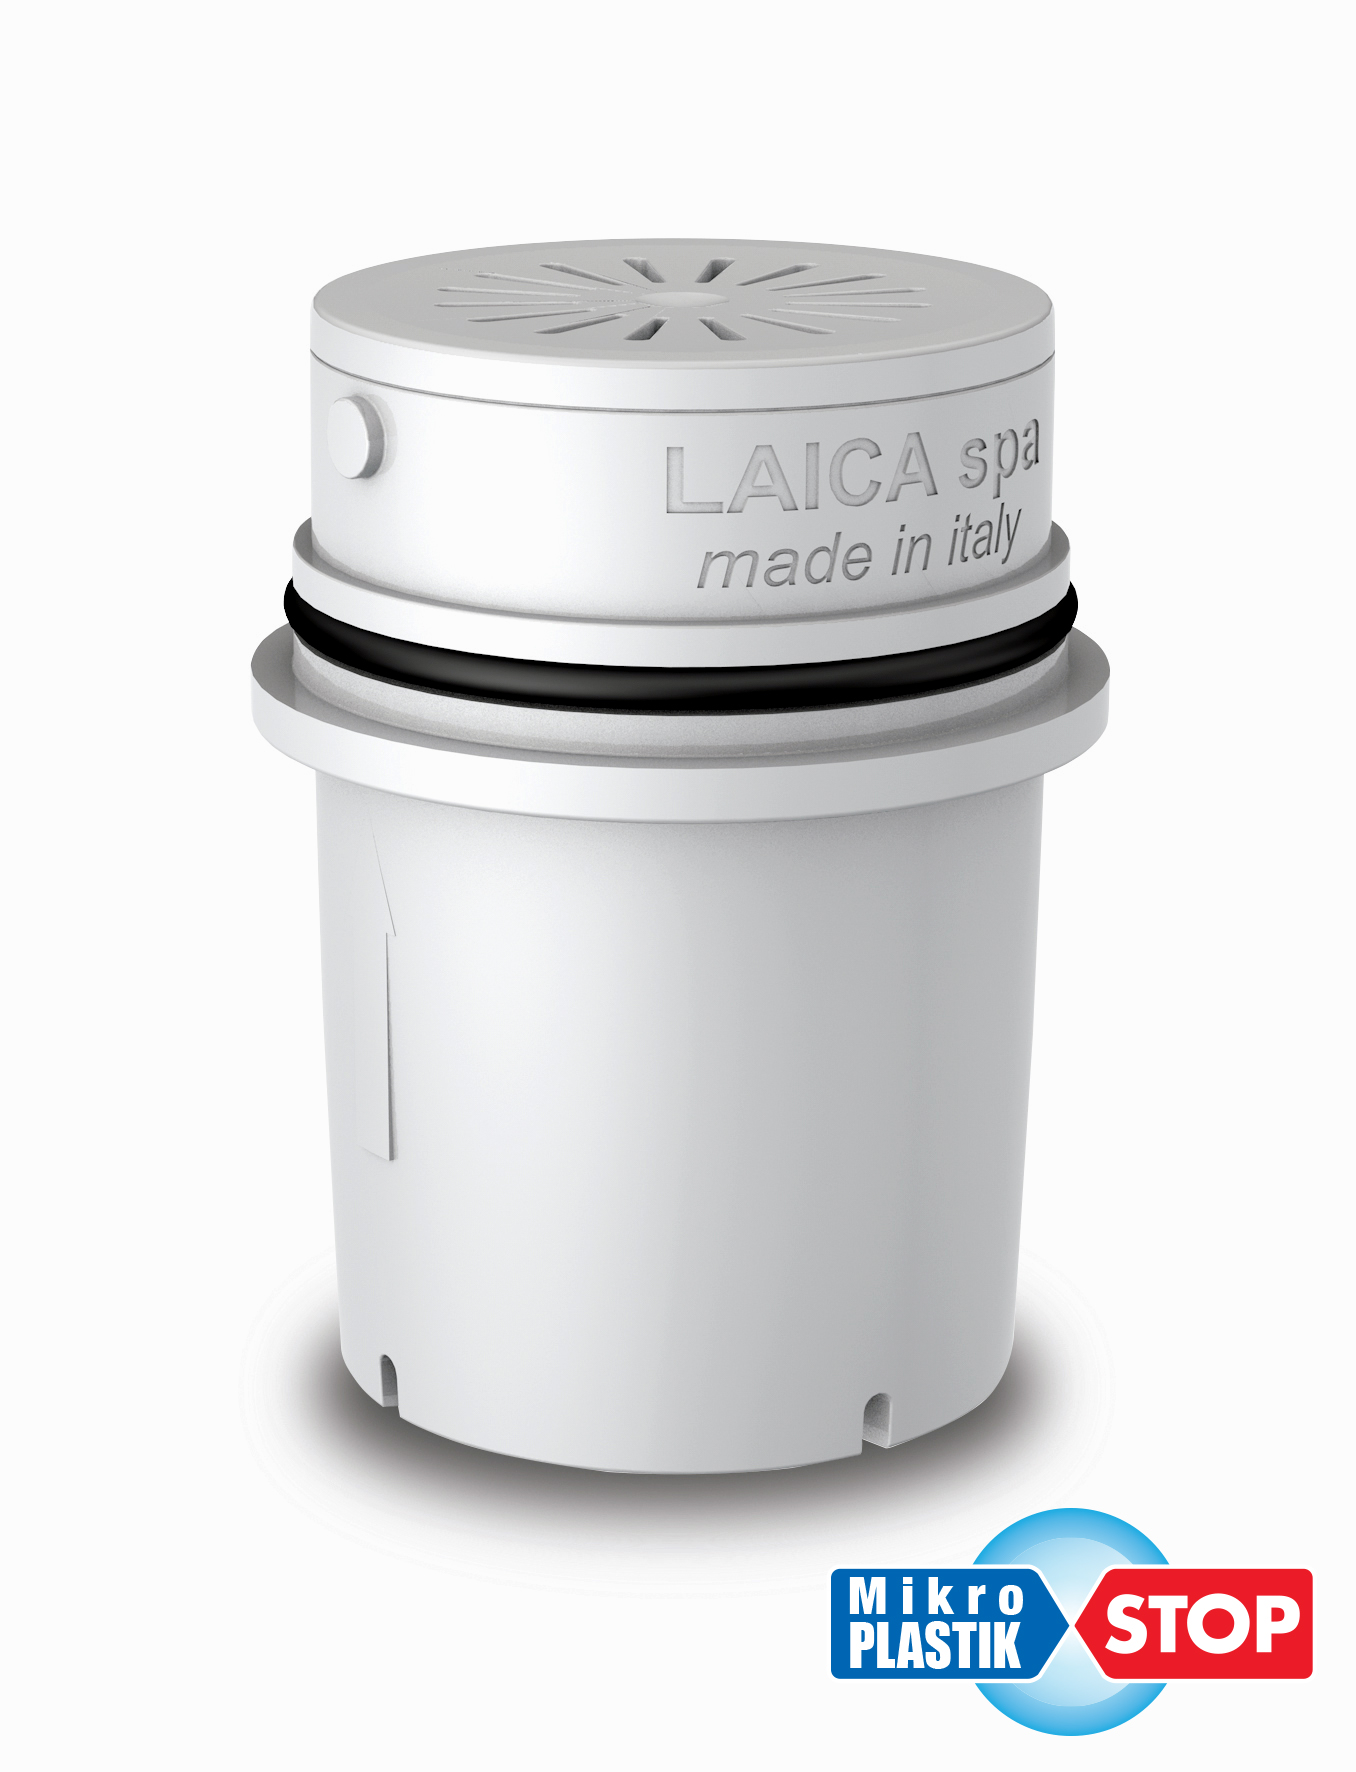 Cartus filtrant Laica MikroPlastik Stop laicashop.ro 2021